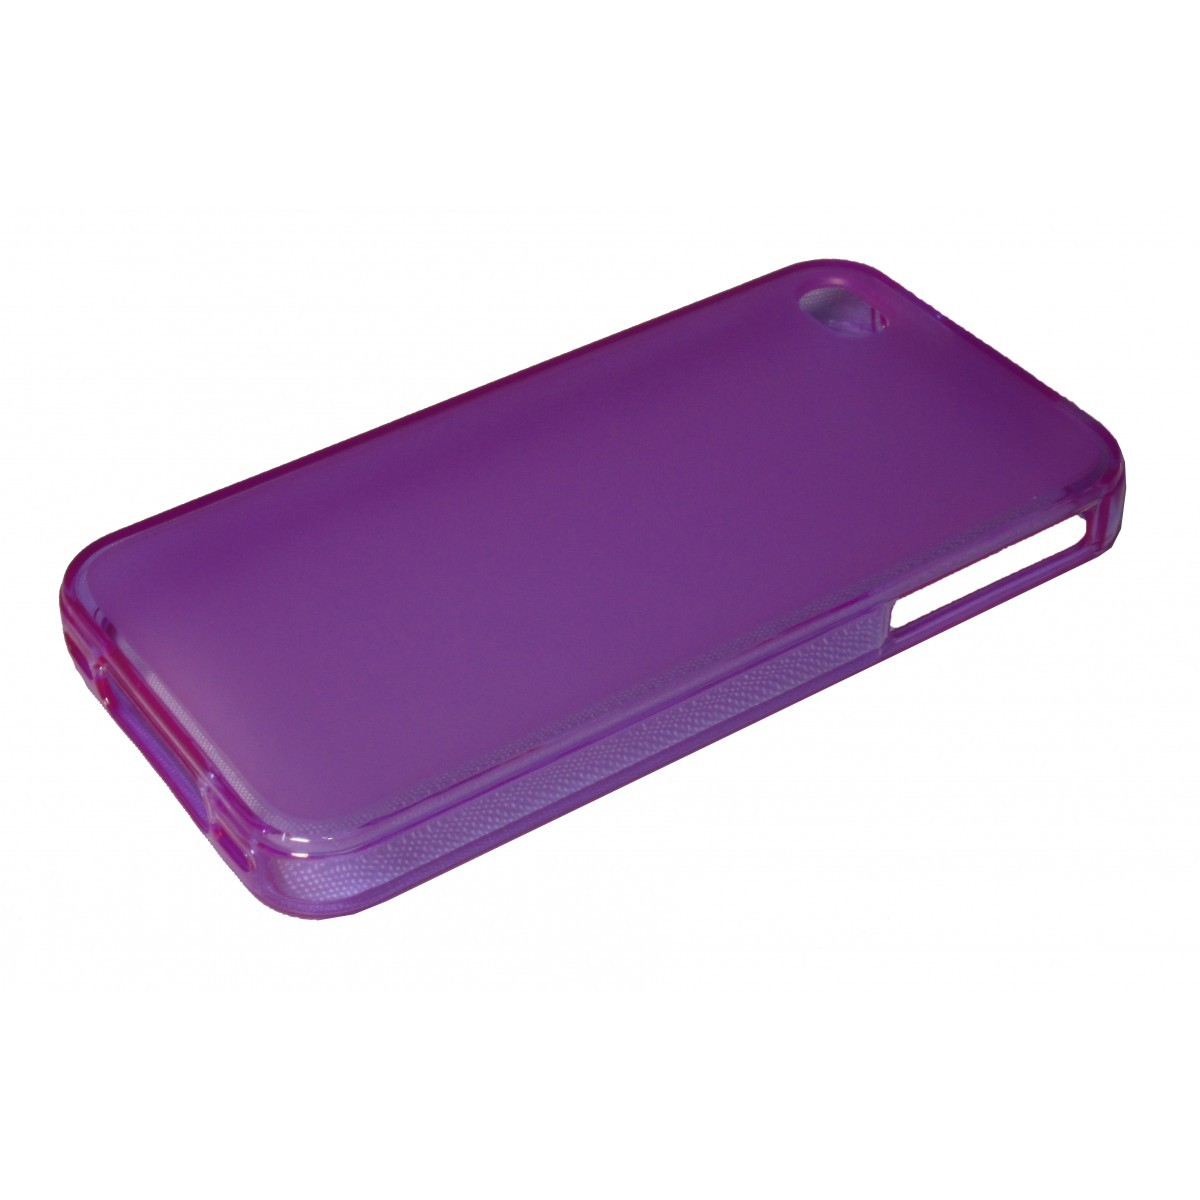 Capa de Tpu para Iphone 4 4S  Pelicula Lilas - Matecki